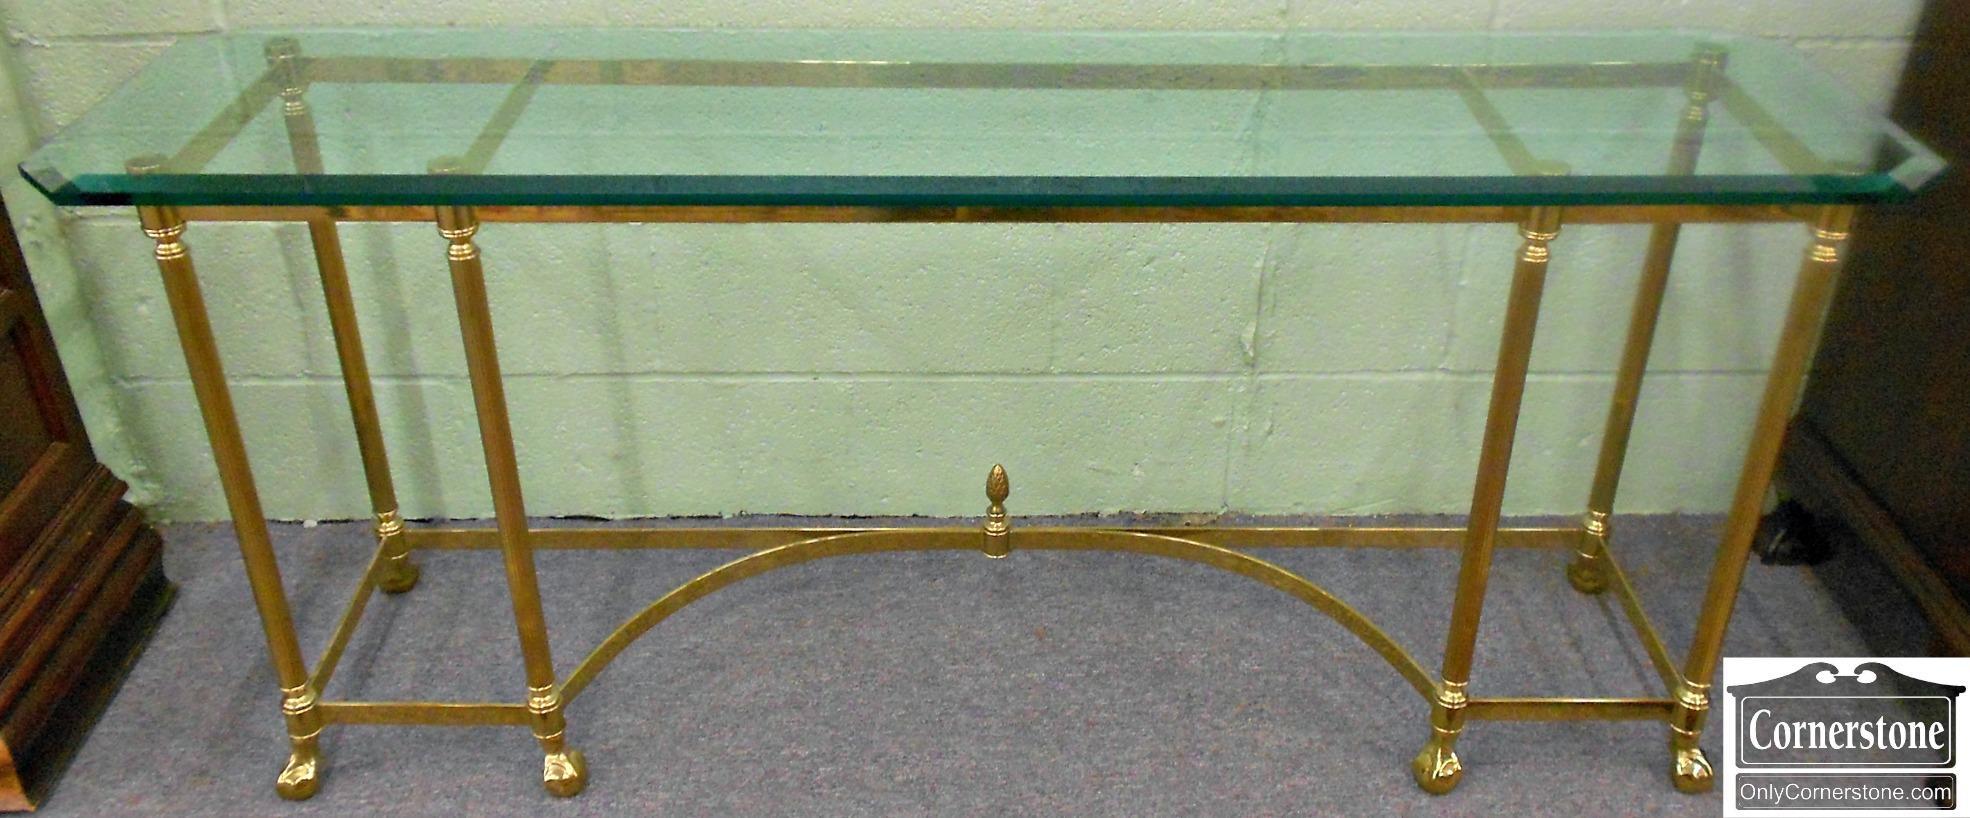 3959-878 Contemporary Brass & Glass Sofa Table